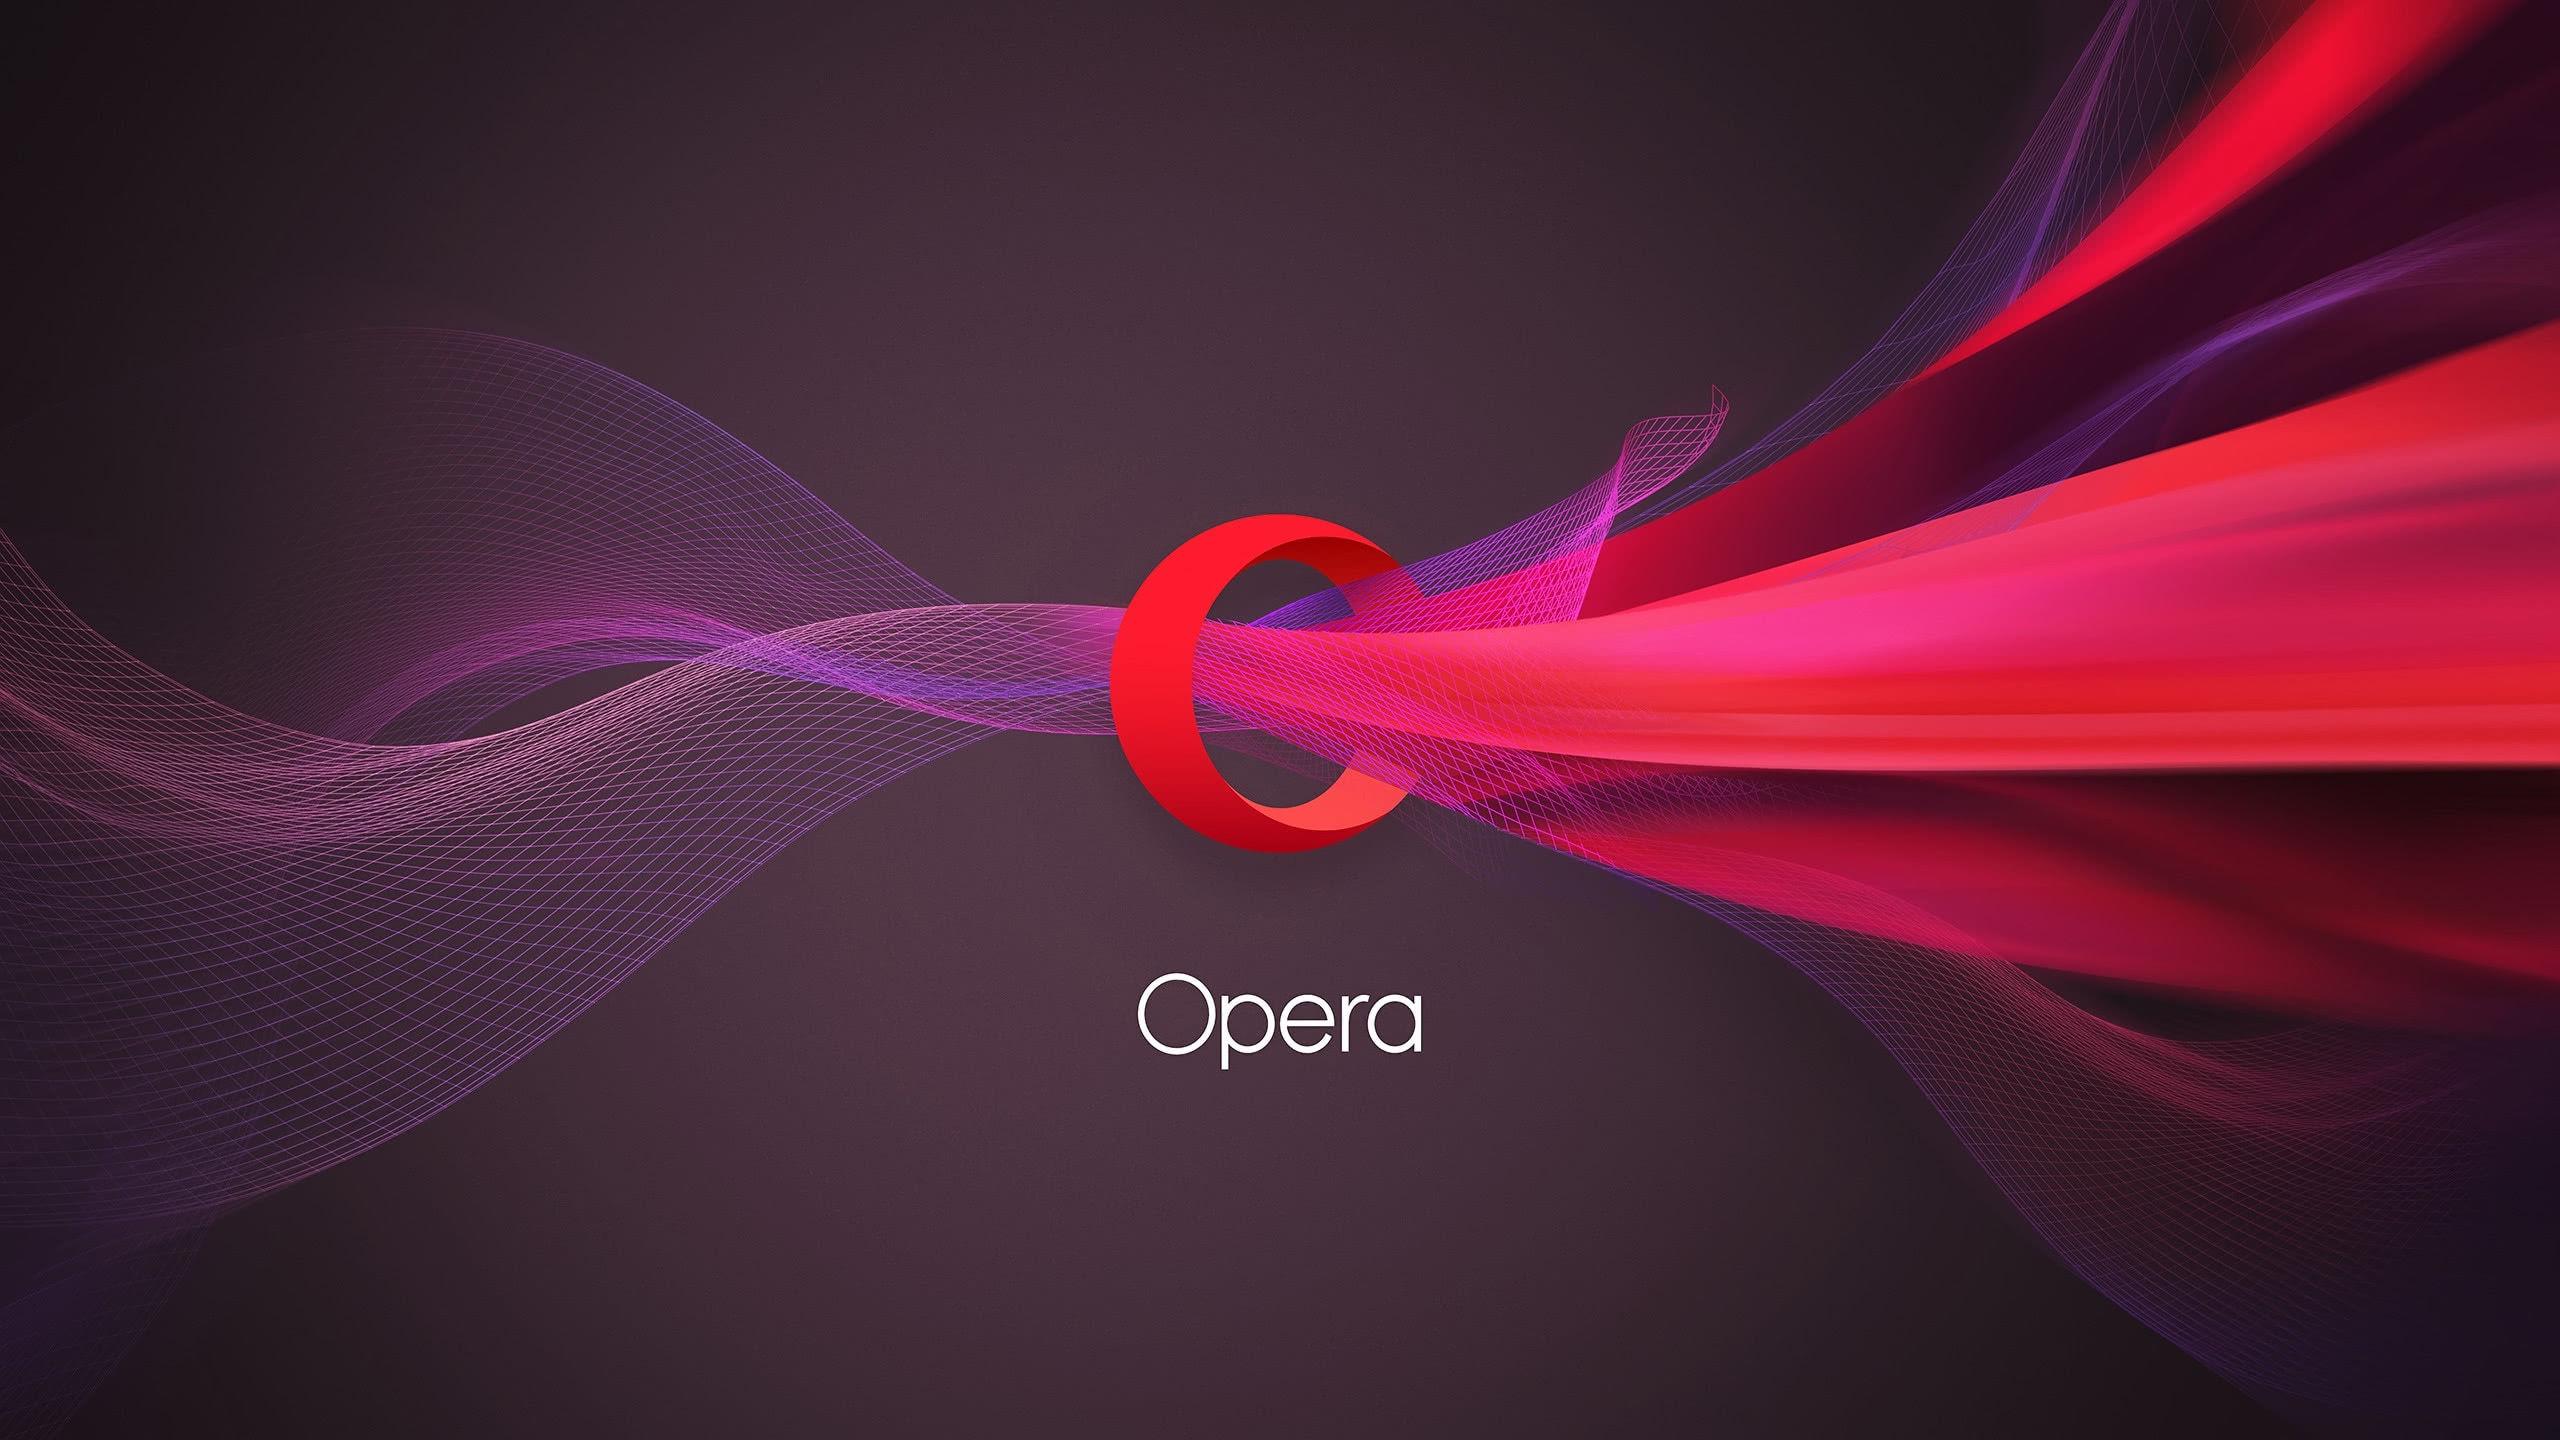 opera logo wqhd 1440p wallpaper